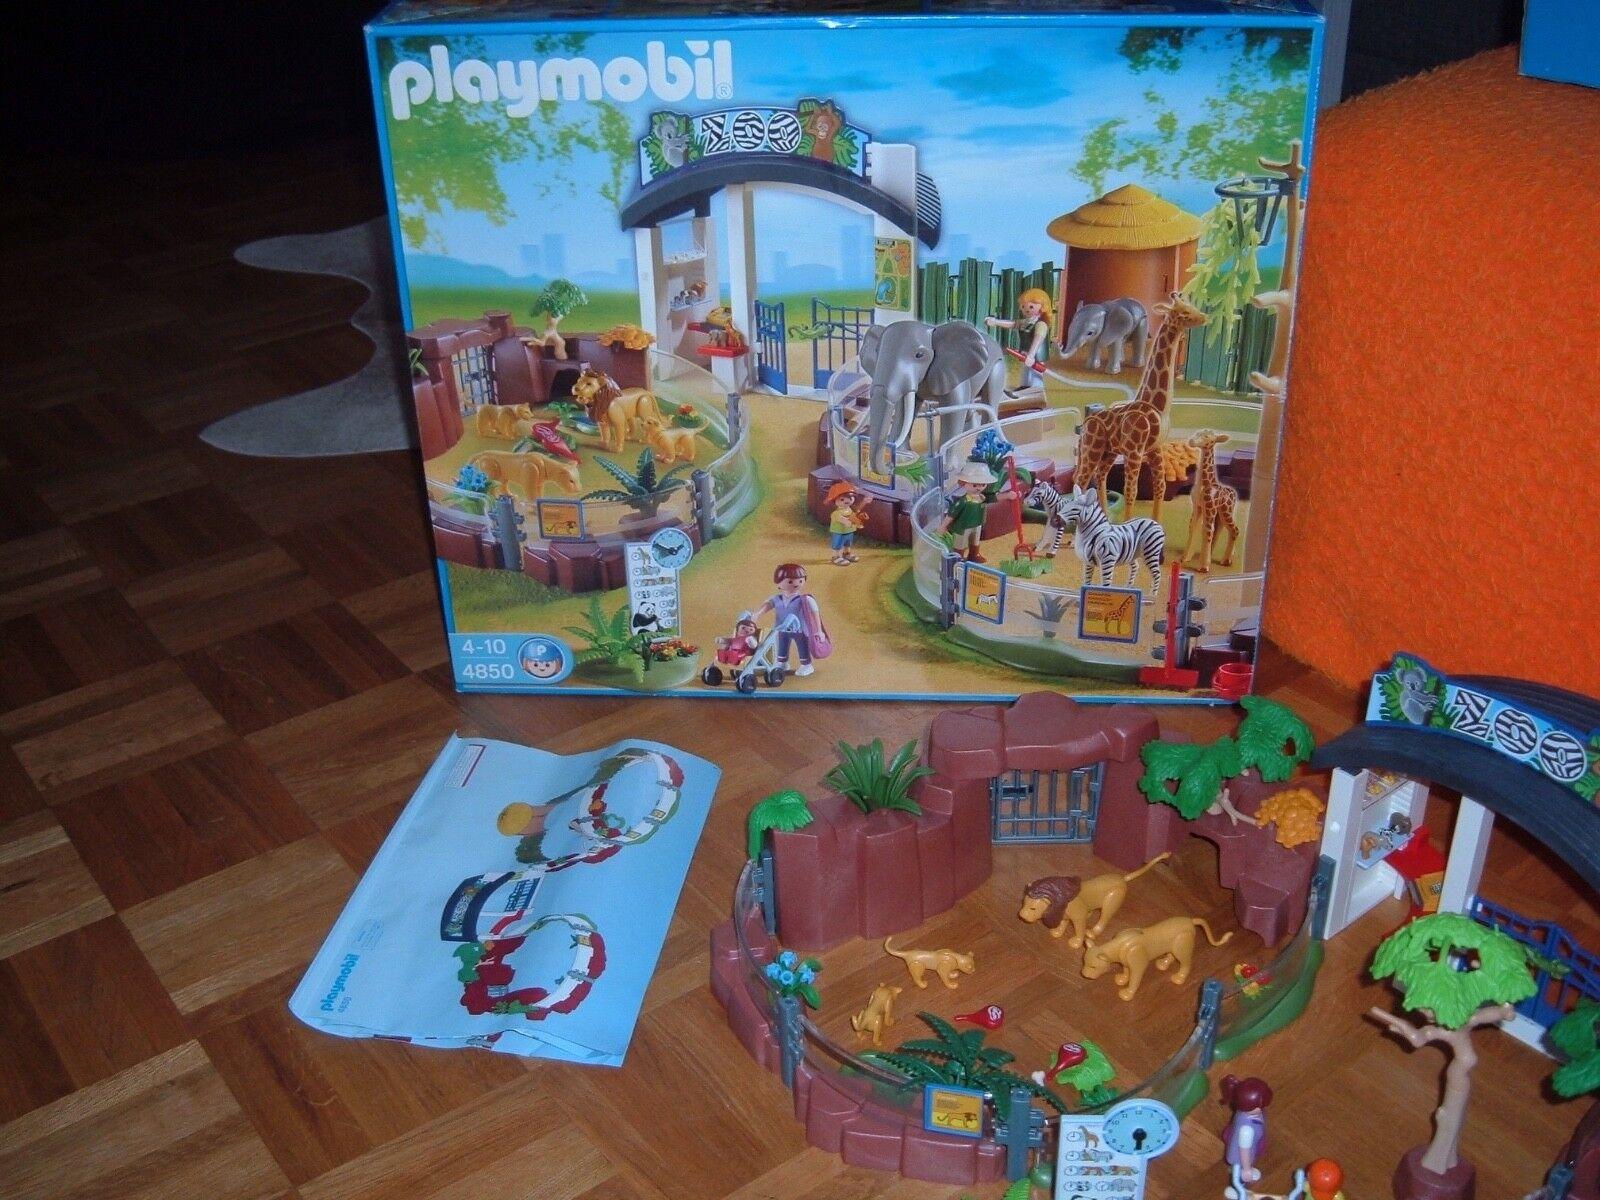 Playmobil 4850 Zoo wie neu in der OVP + Anleitung vollzählig